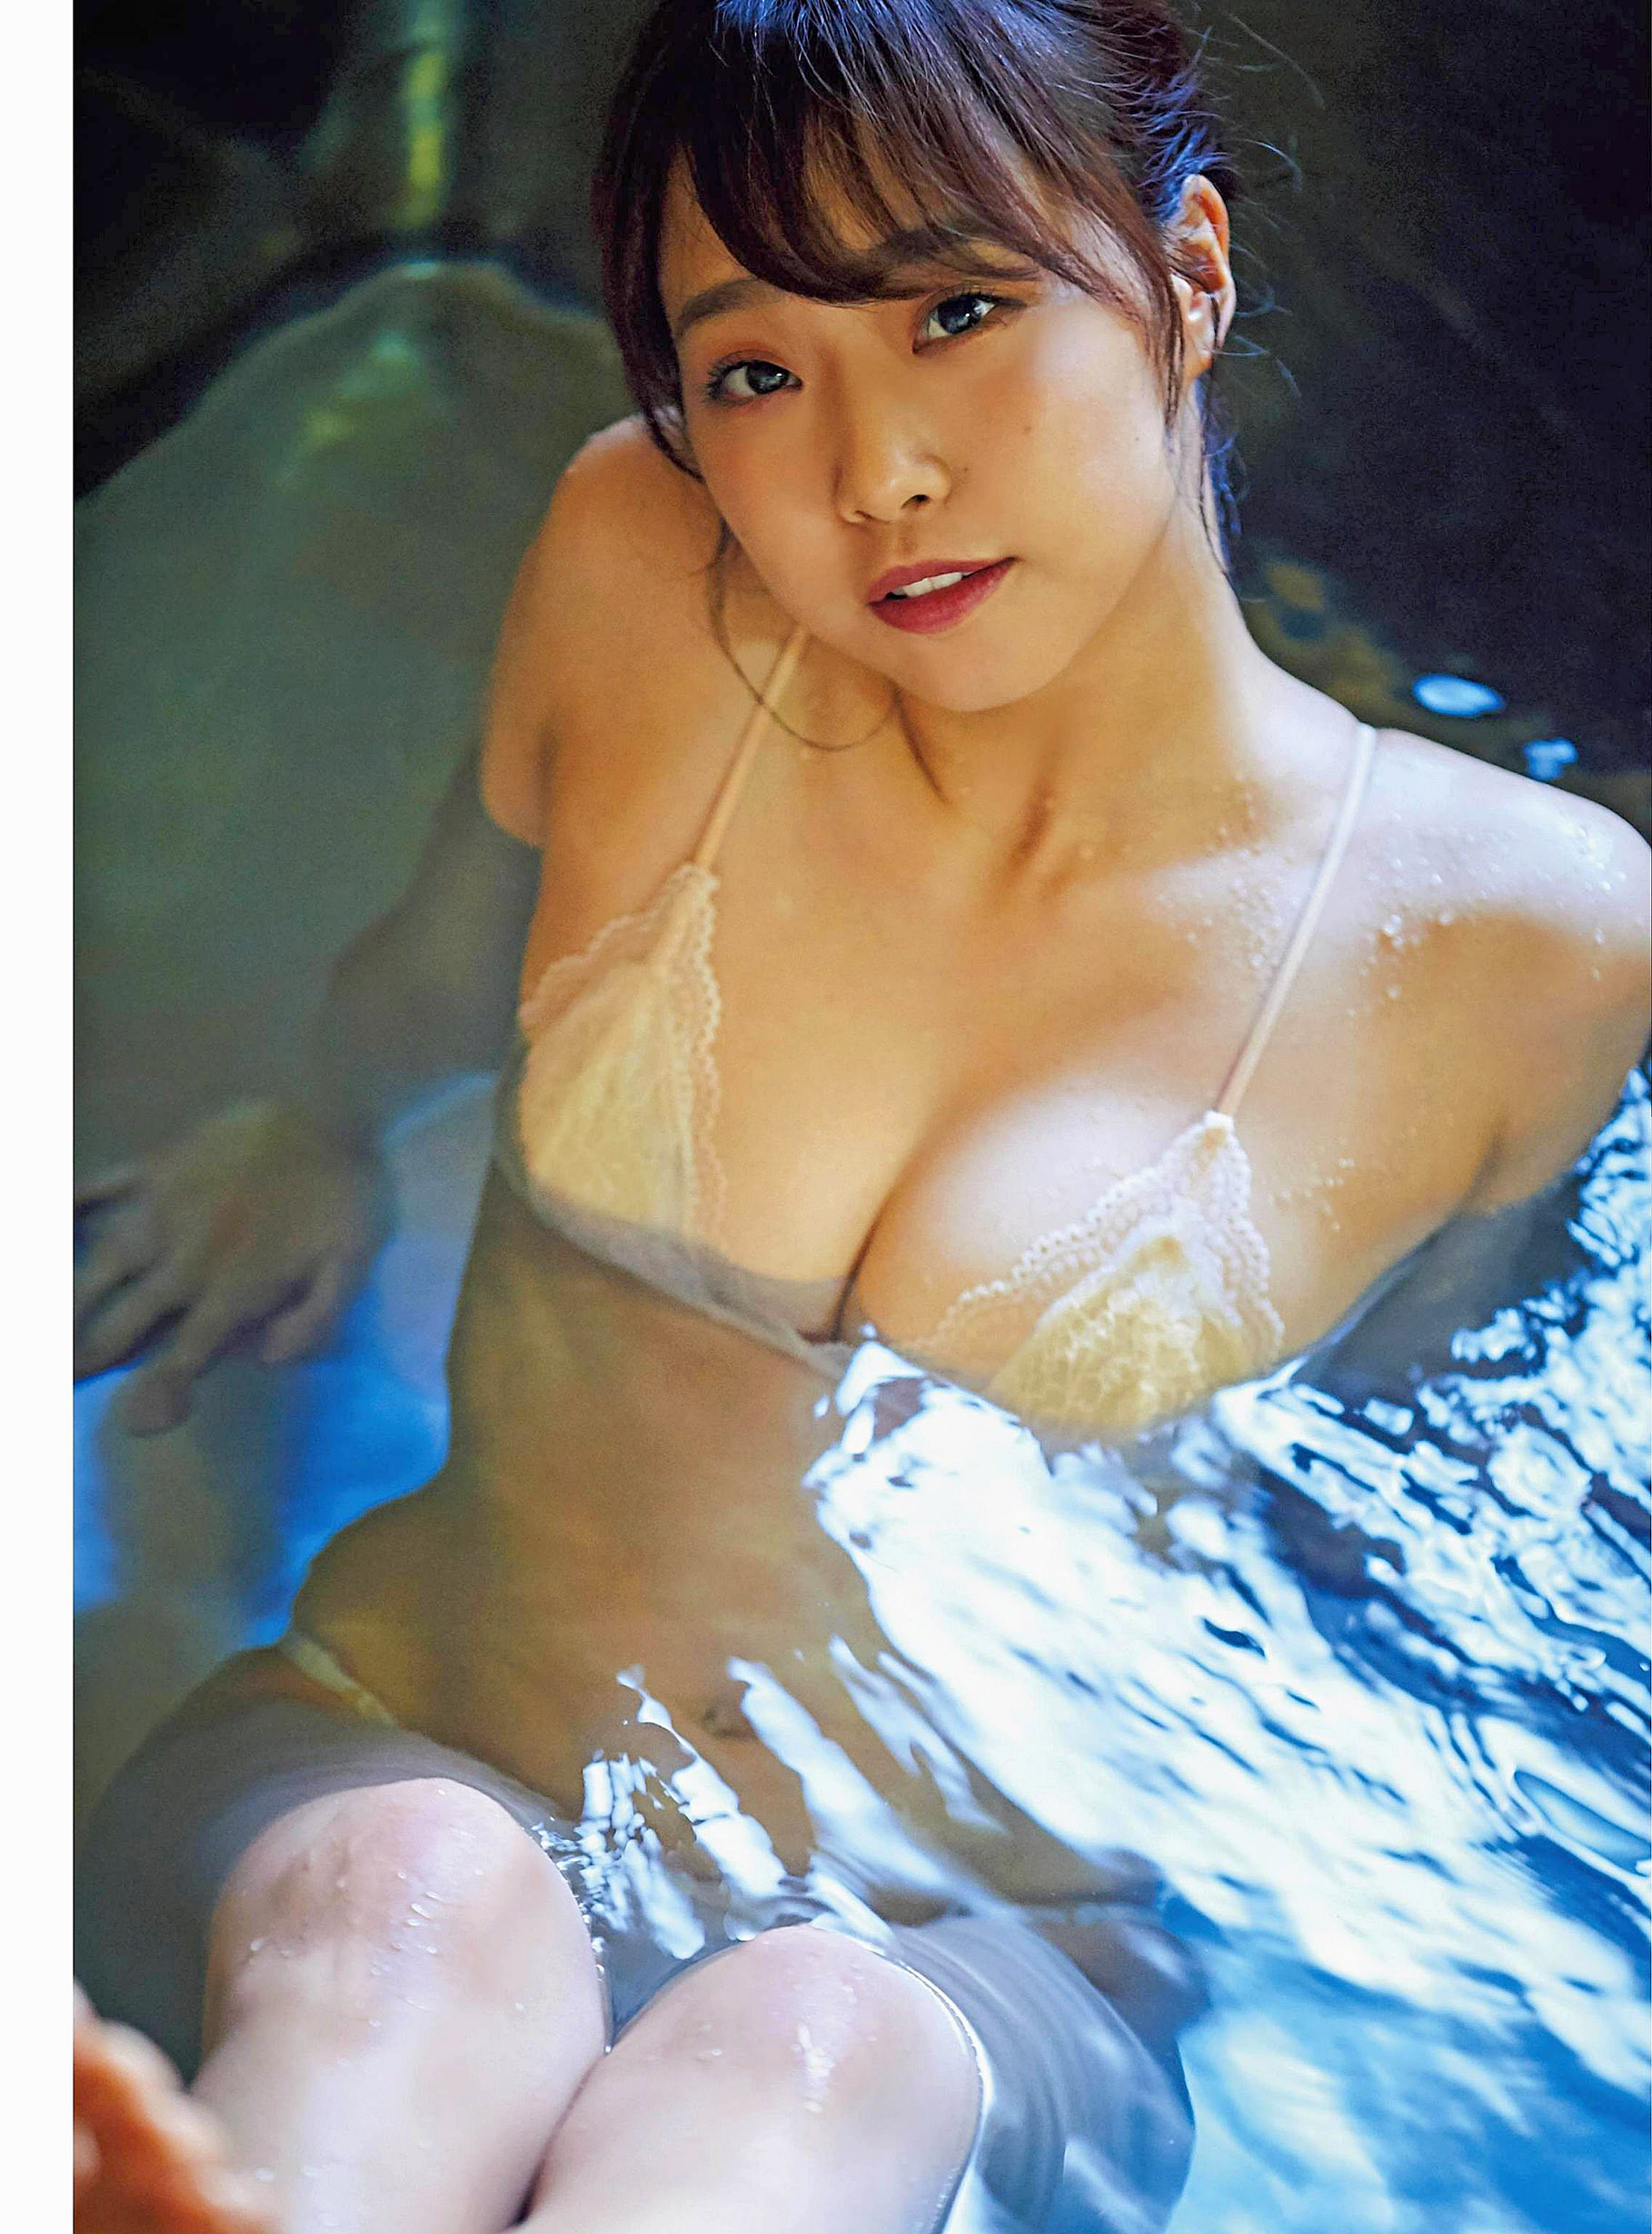 Yuuka Kato NMB48 EnTame 2001 05.jpg